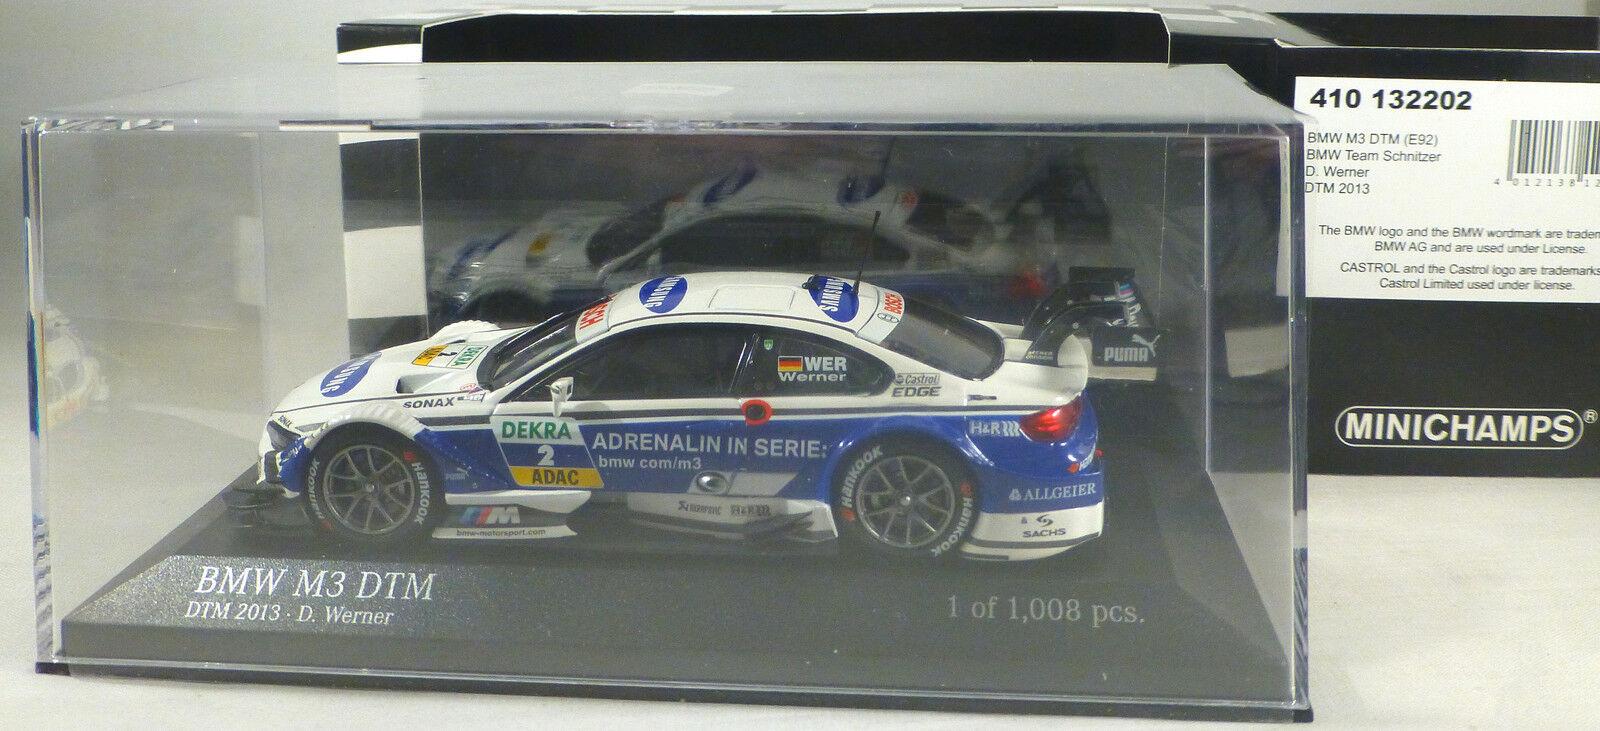 BMW M3 DTM  2 Dirk WERNER squadra SCHNITZER DTM 2013 limited 1,008 MINICHAMPS 1 43